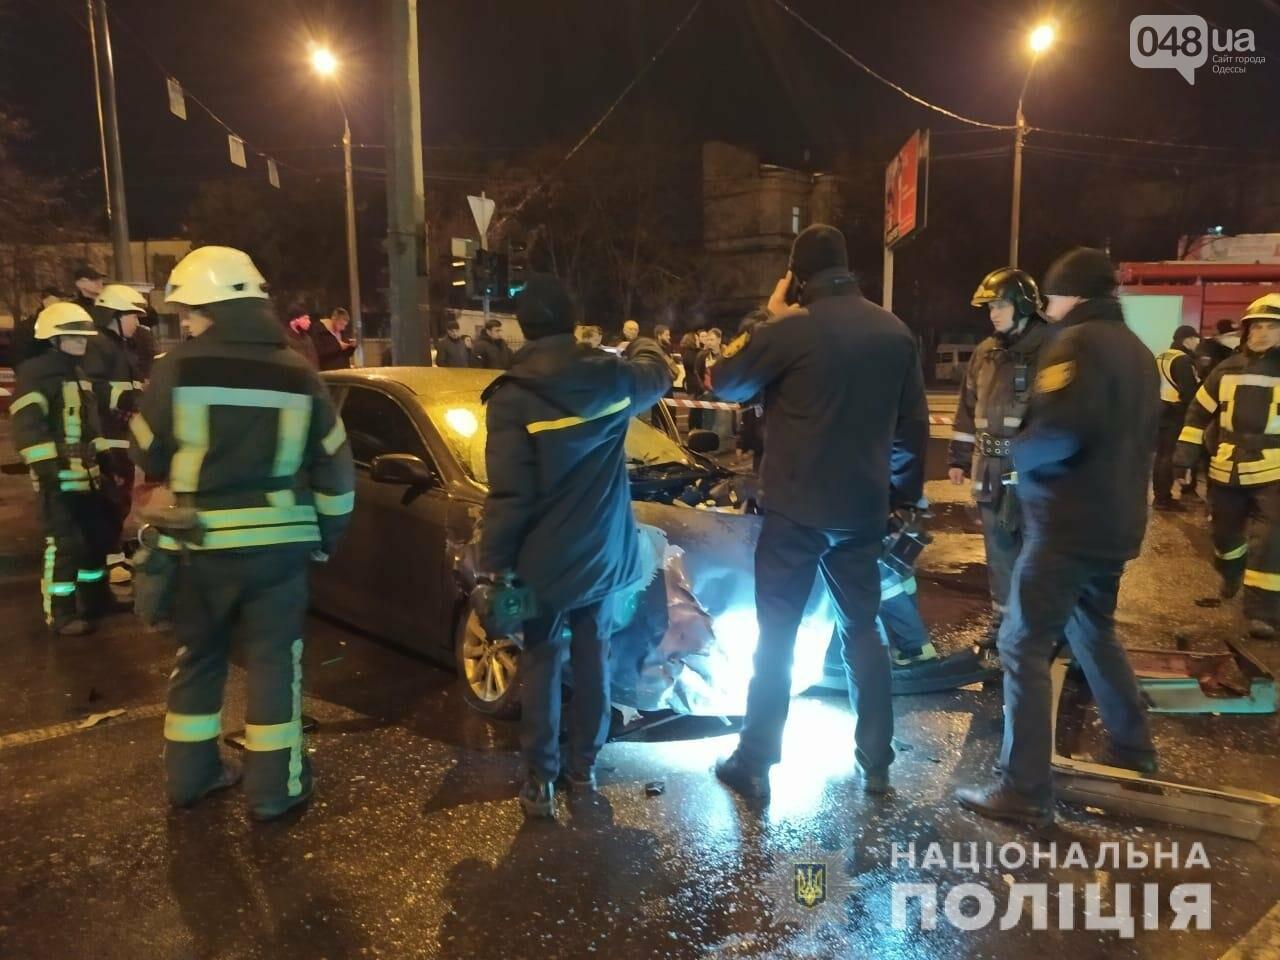 В Одессе в ночном ДТП погибли два человека, - ФОТО, ВИДЕО, ОБНОВЛЕНО, фото-4